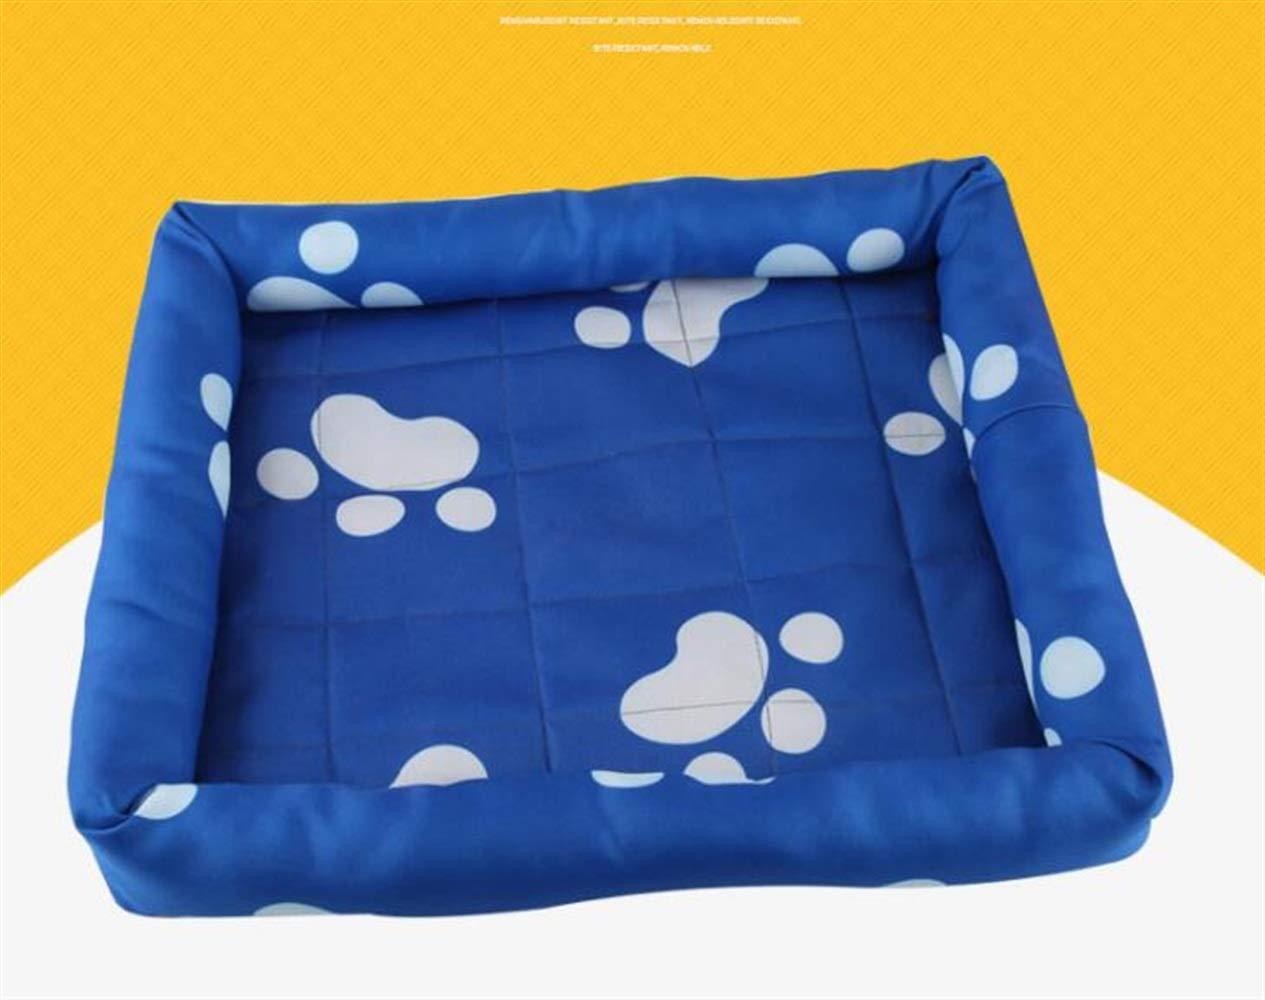 economico online Huihuger Pet Blanket Letto per Casse Casse Casse per Cani Resistente all'Acqua (Blu  online economico